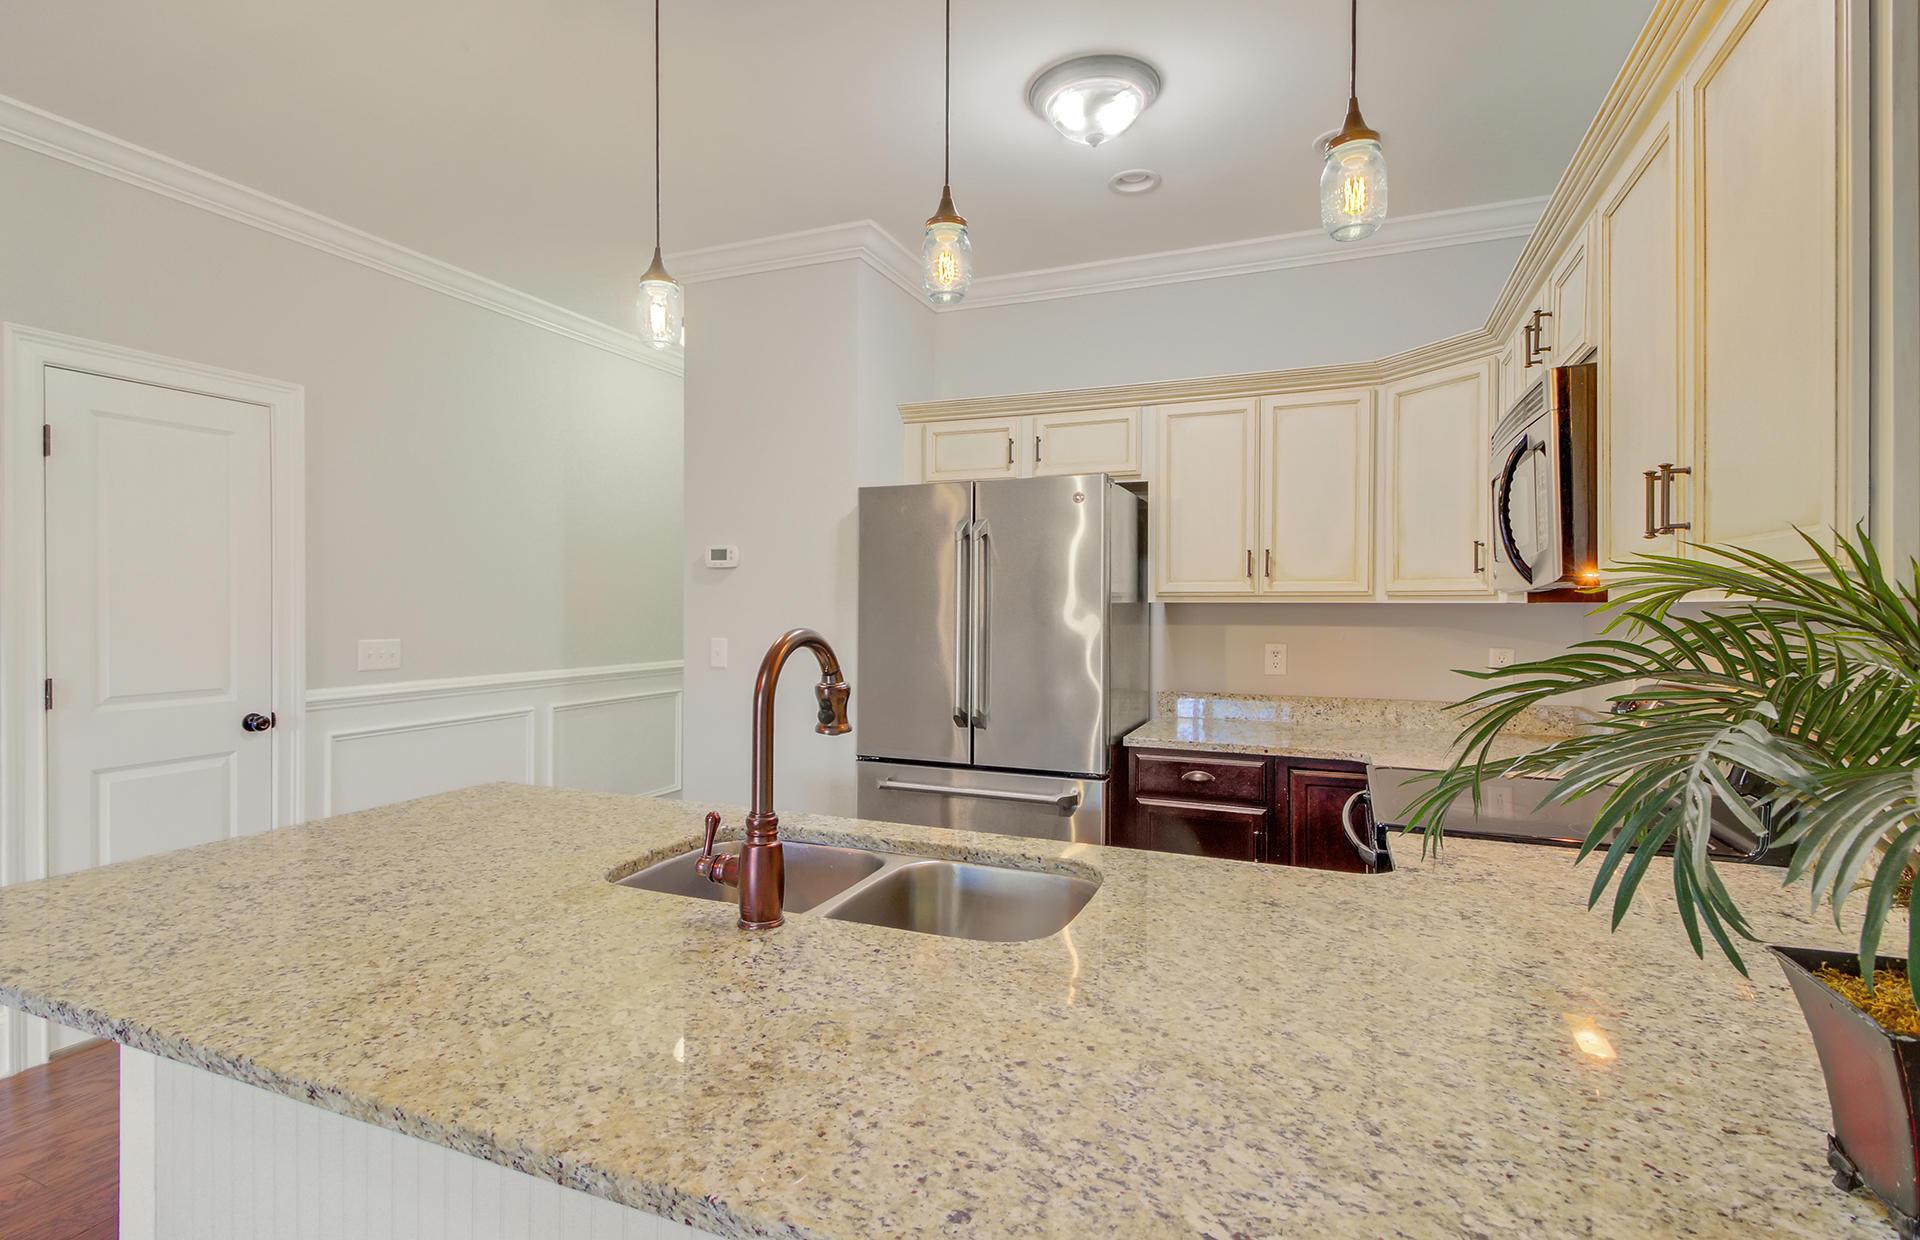 Carol Oaks Town Homes Homes For Sale - 2960 Emma, Mount Pleasant, SC - 5